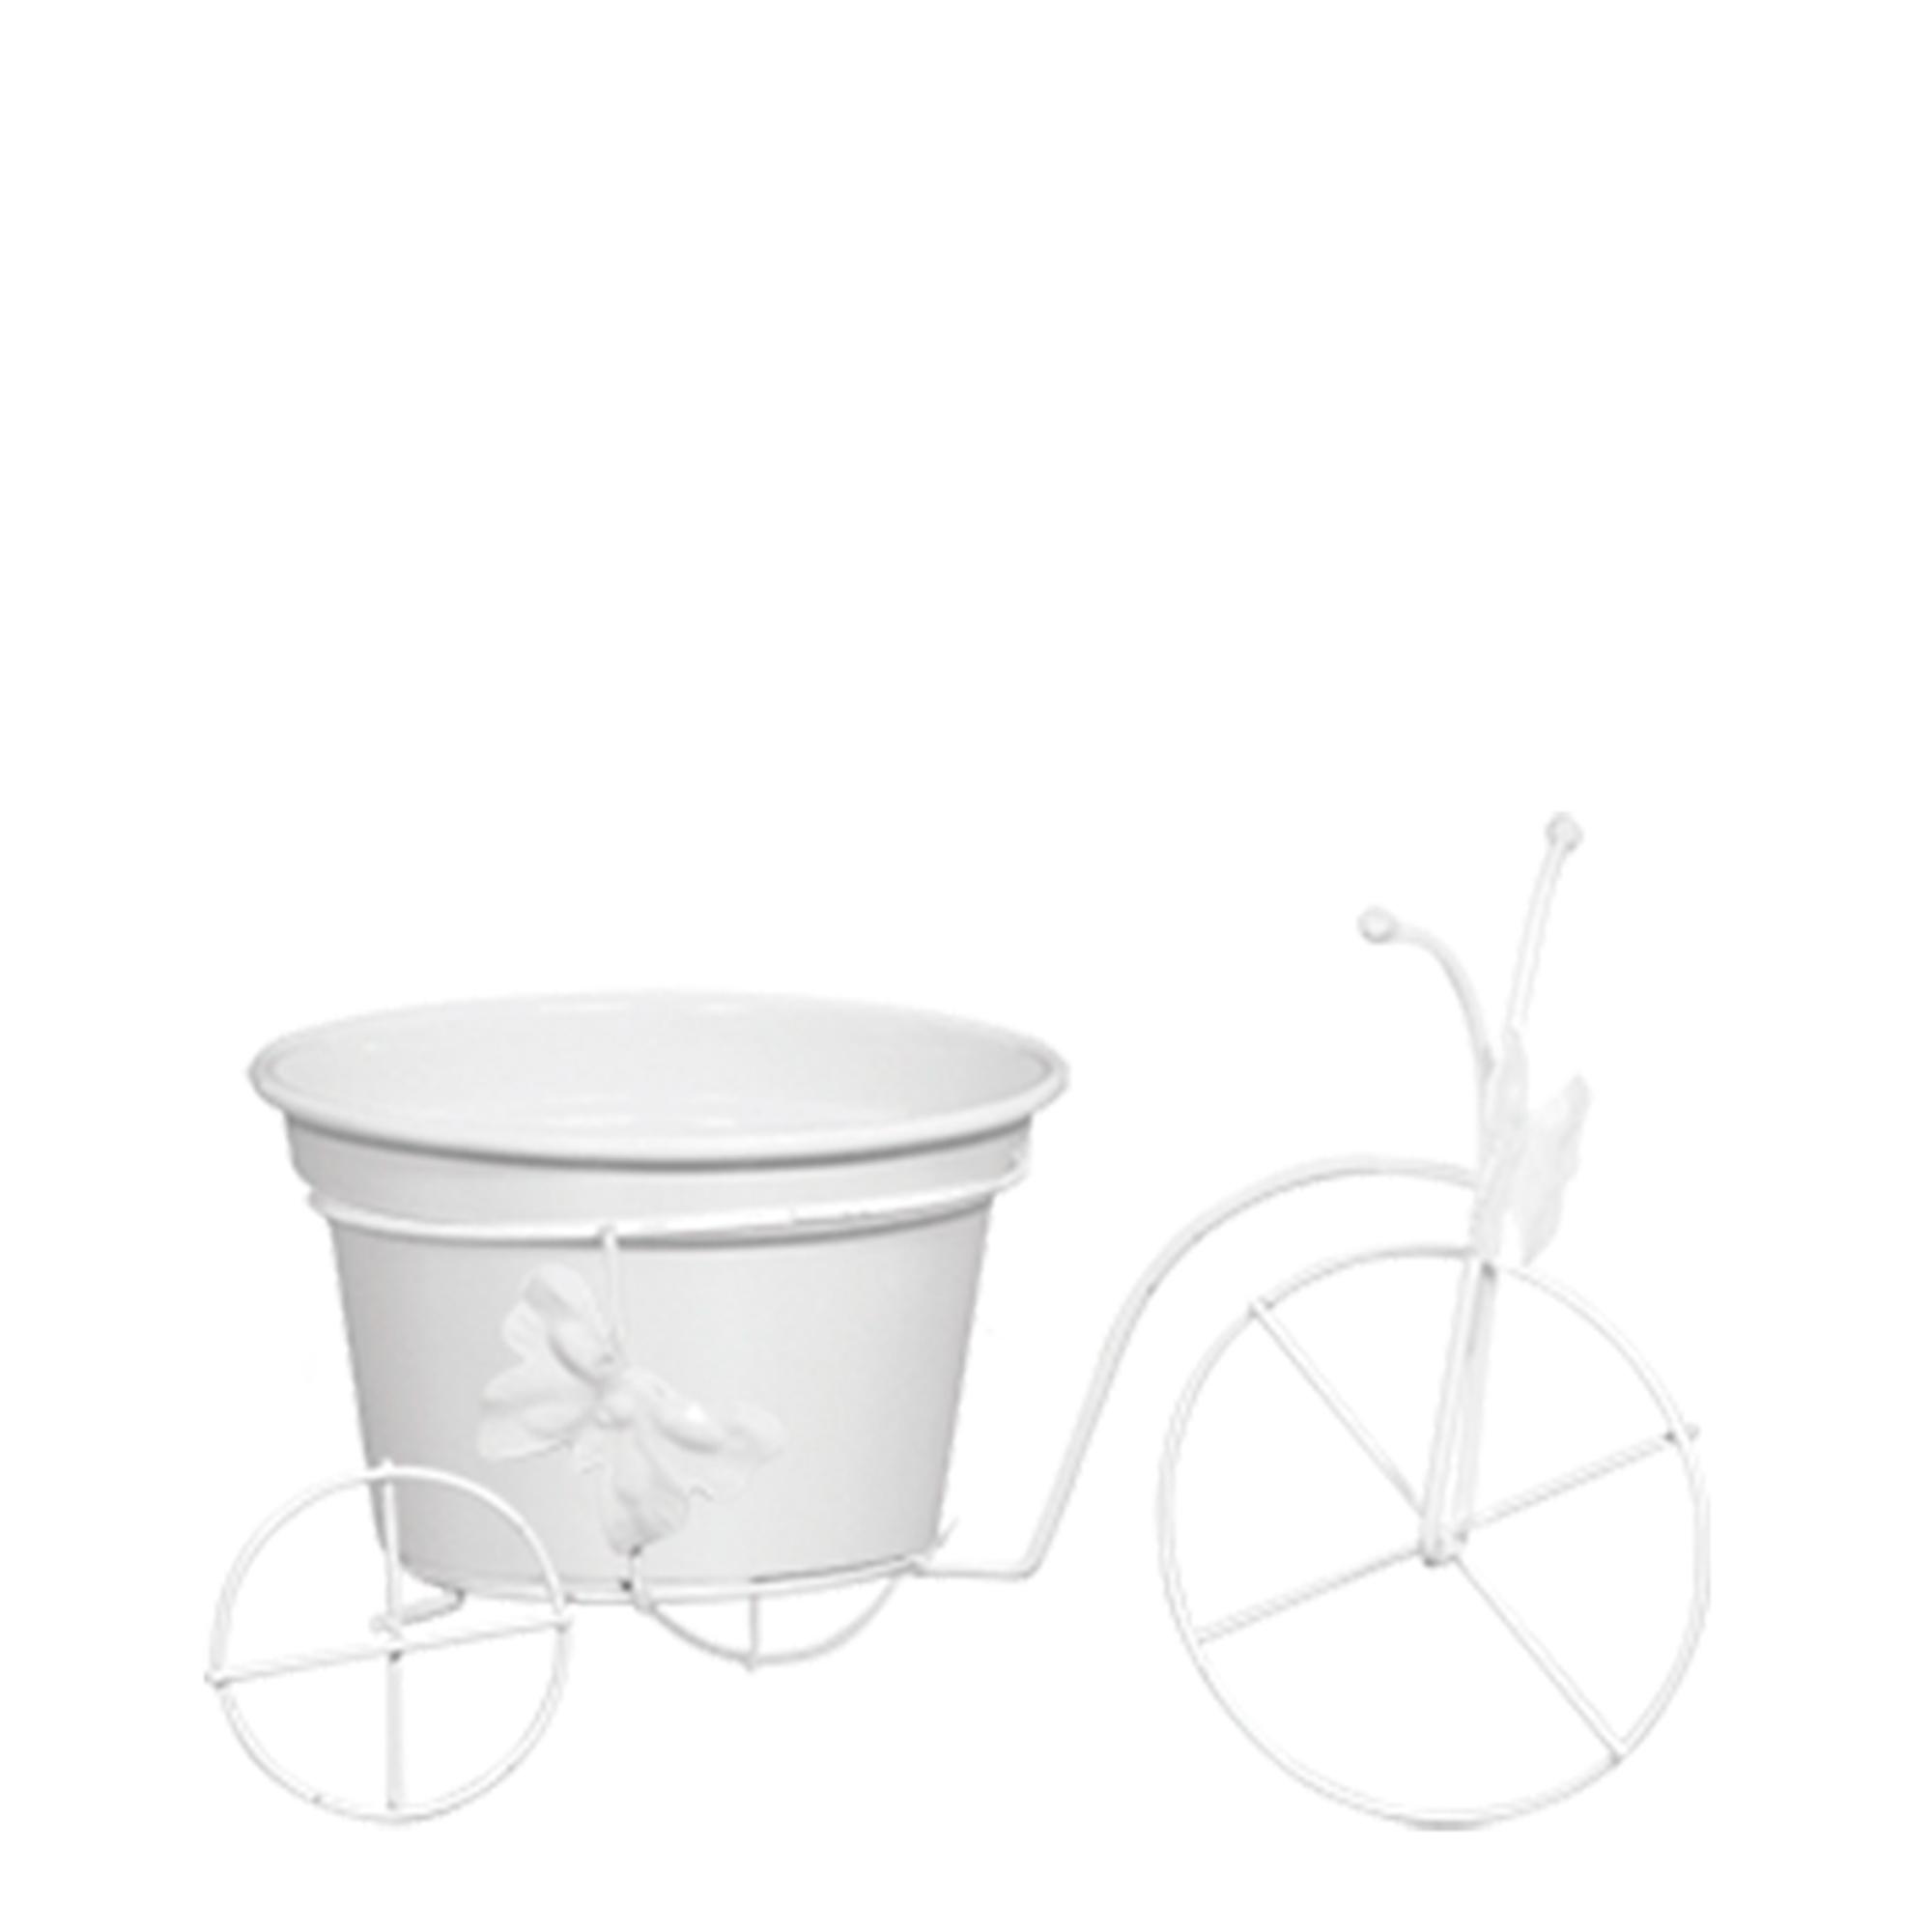 Bicicleta c/ Borboleta Vaso 11